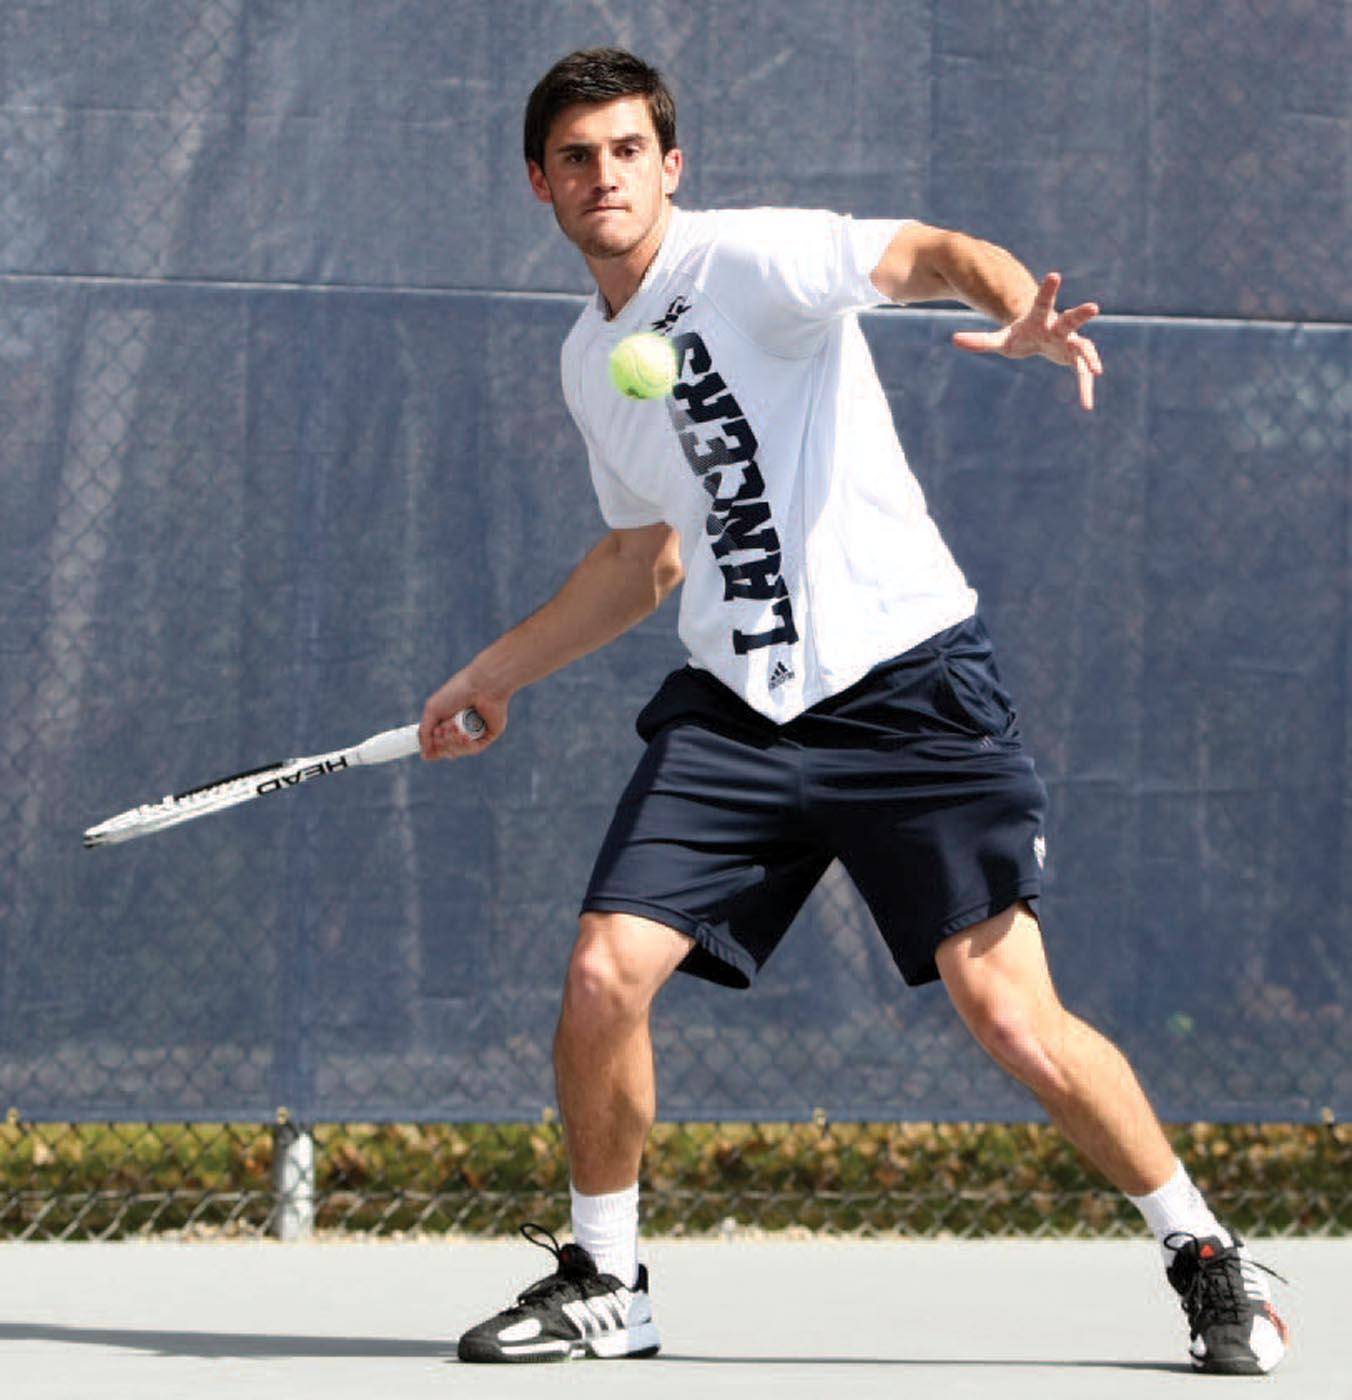 Georgi Khmiadashvili '13 played out of the No. 1 singles position on the men's tennis team.